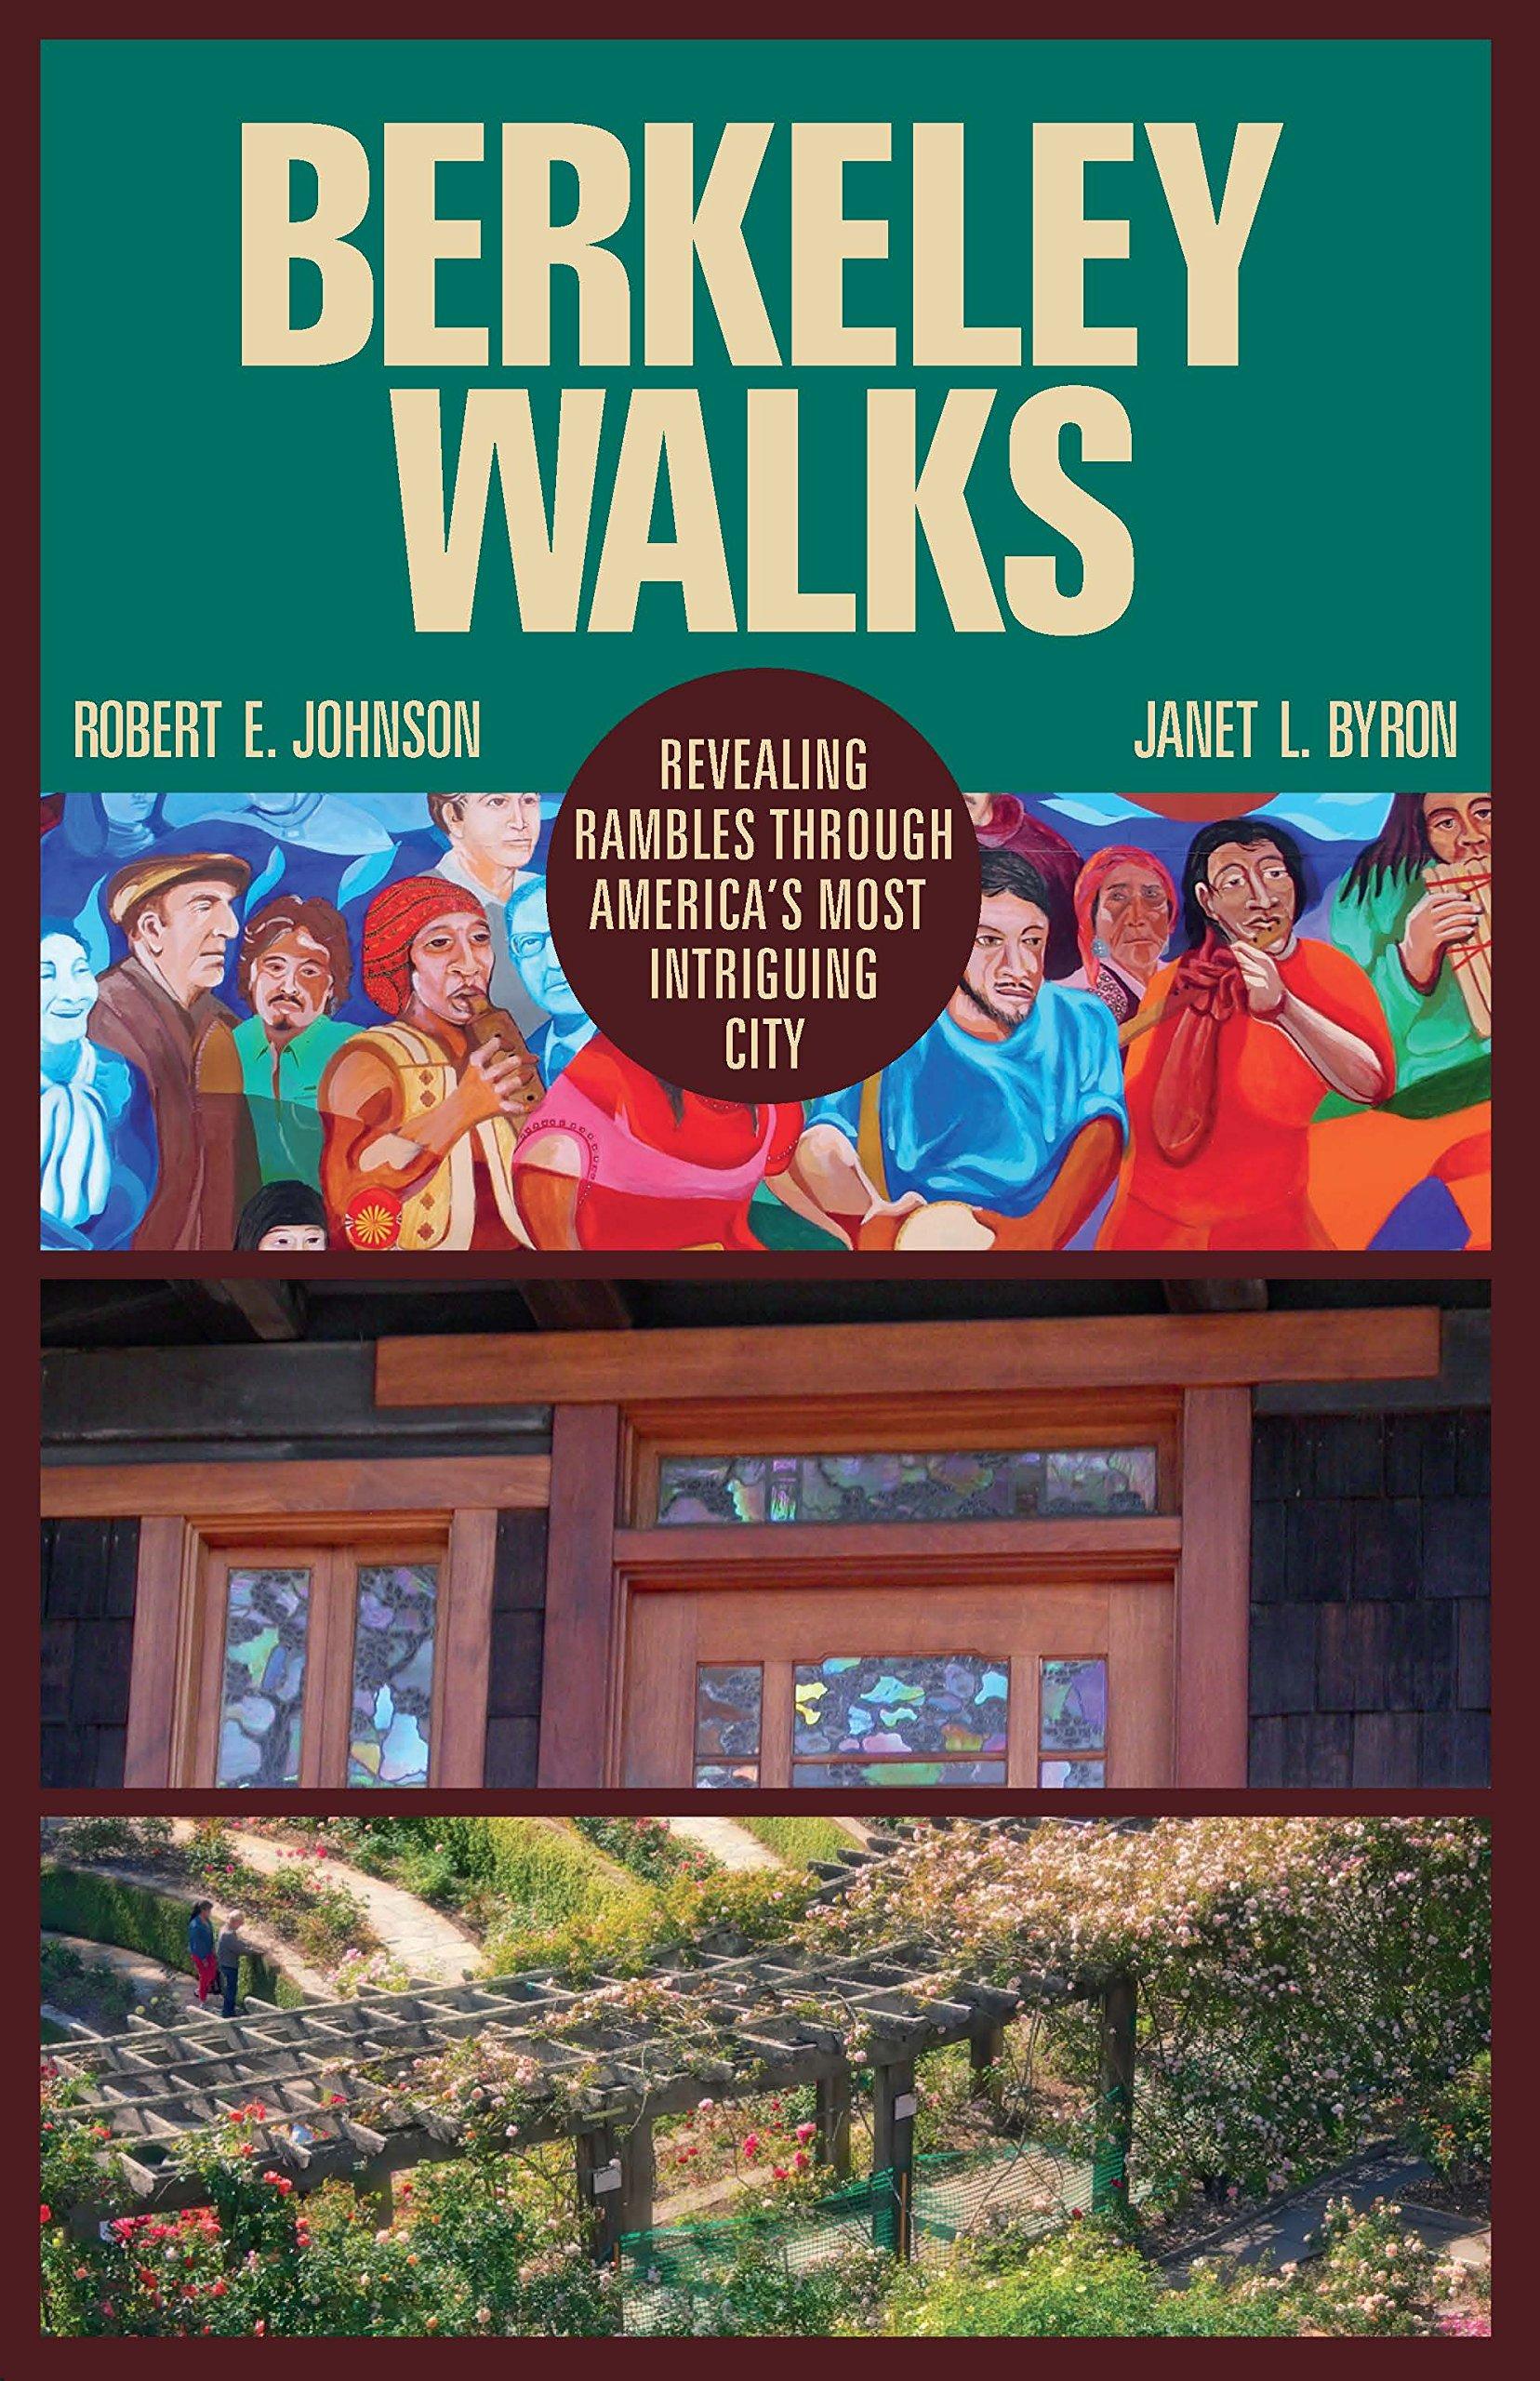 Berkeley Walks: Revealing Rambles through America's Most Intriguing City